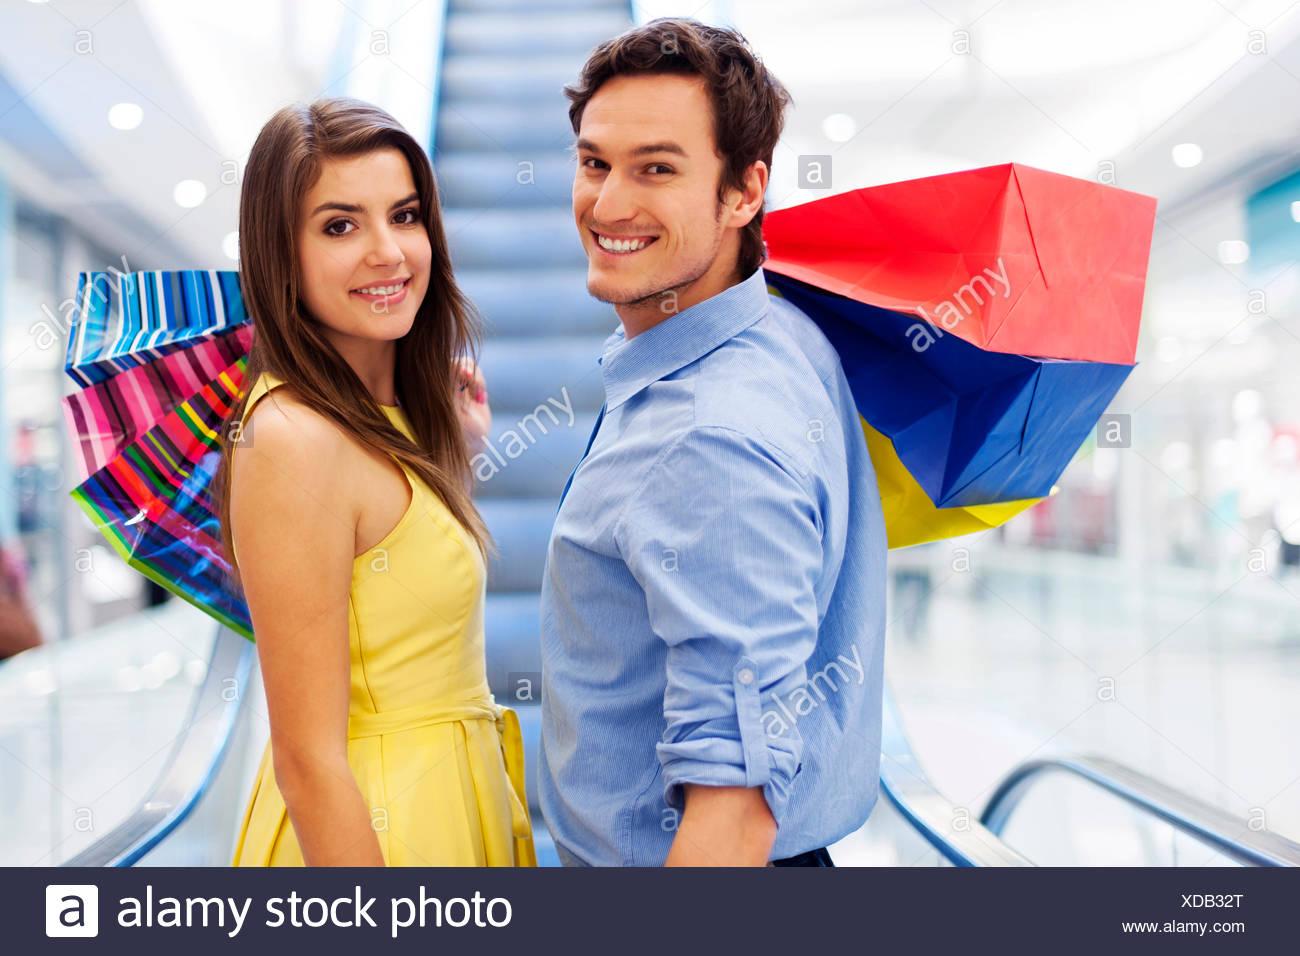 Smiling couple on escalator in shopping mall Debica, Poland - Stock Image